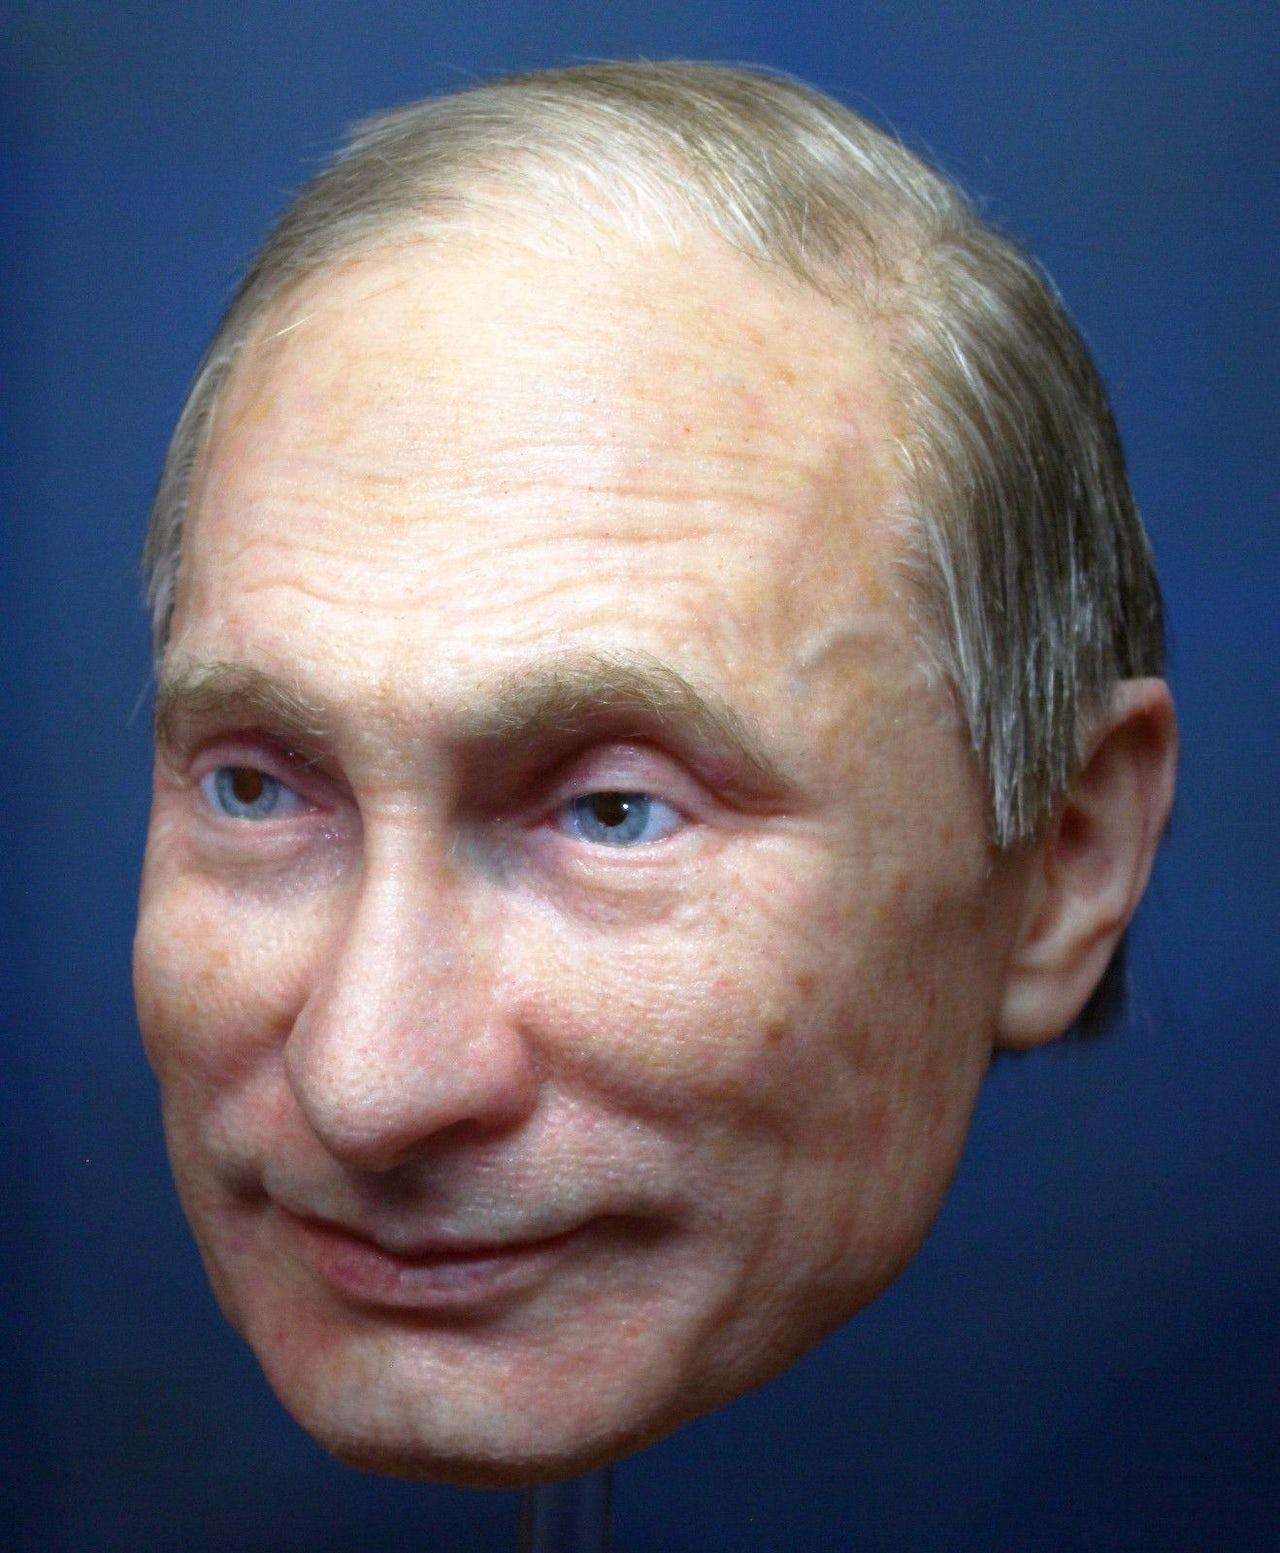 A realistic mask of Vladimir Putin.